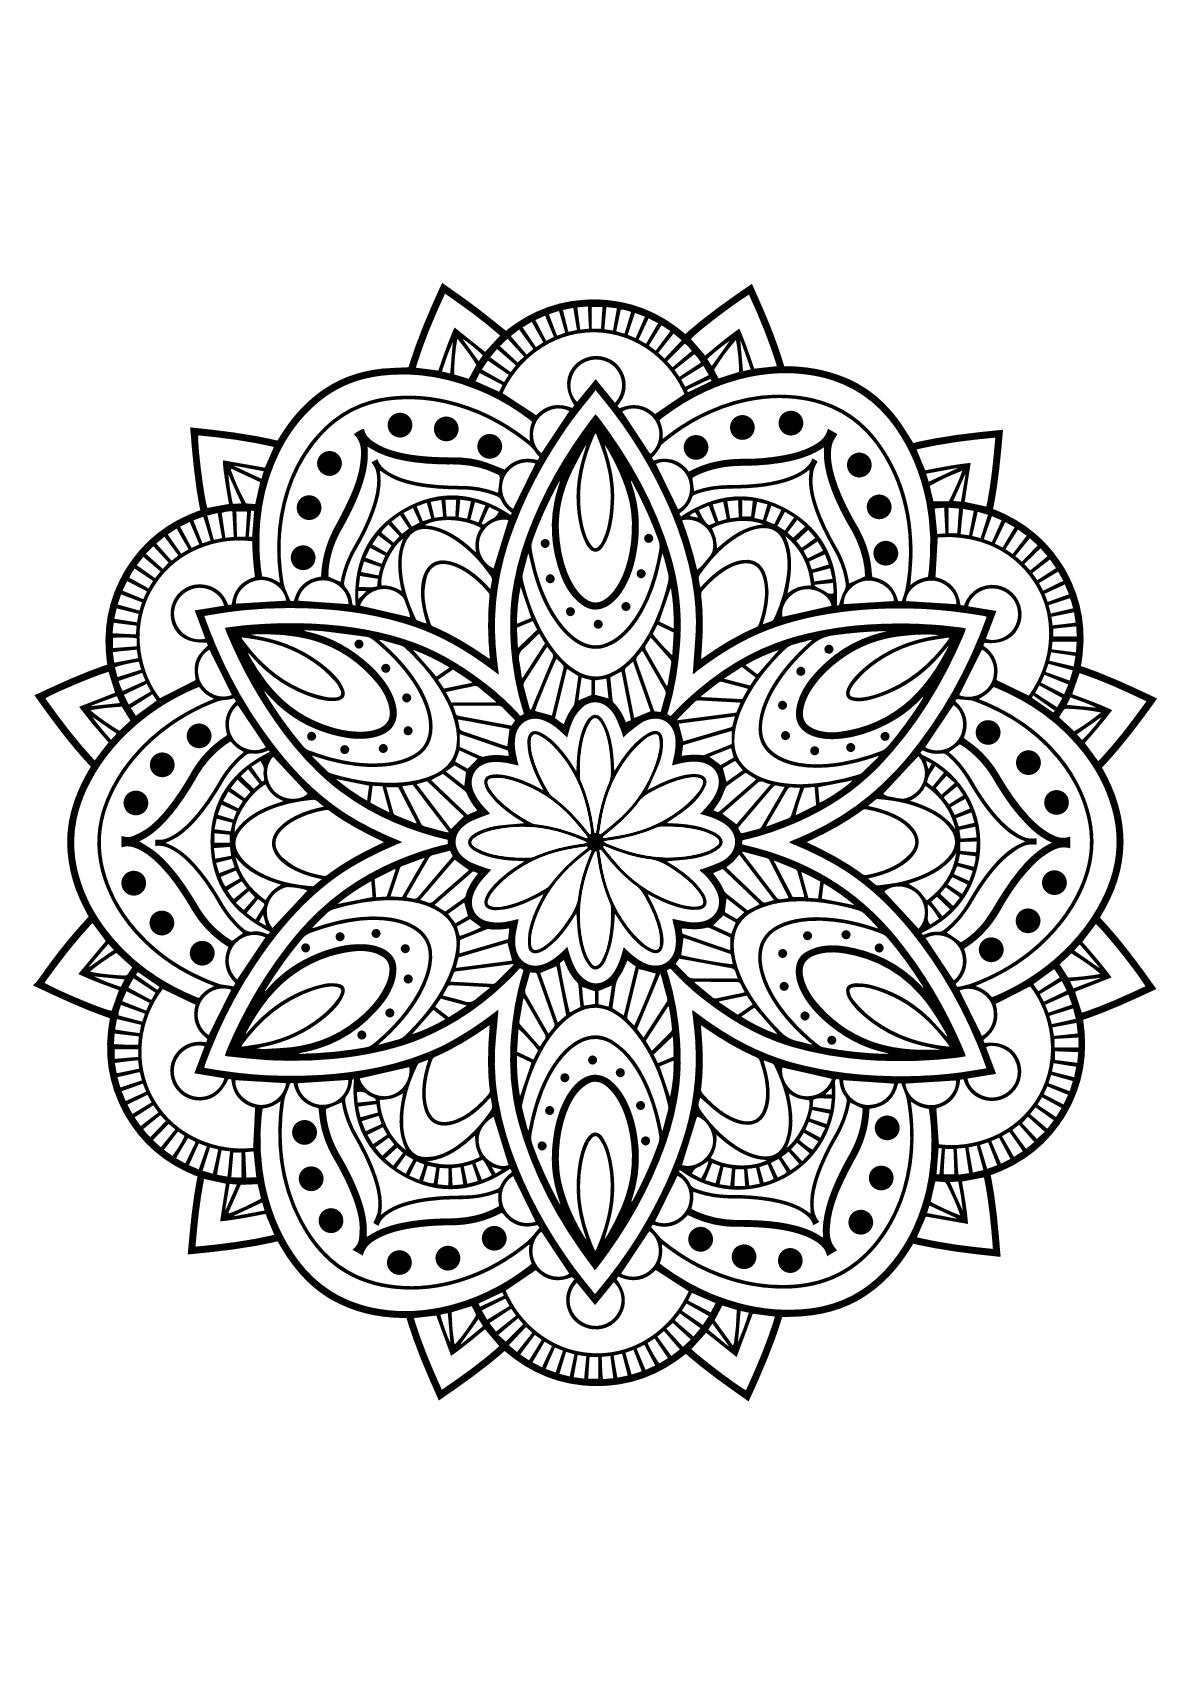 Mandalas to color for children - Mandalas Kids Coloring Pages